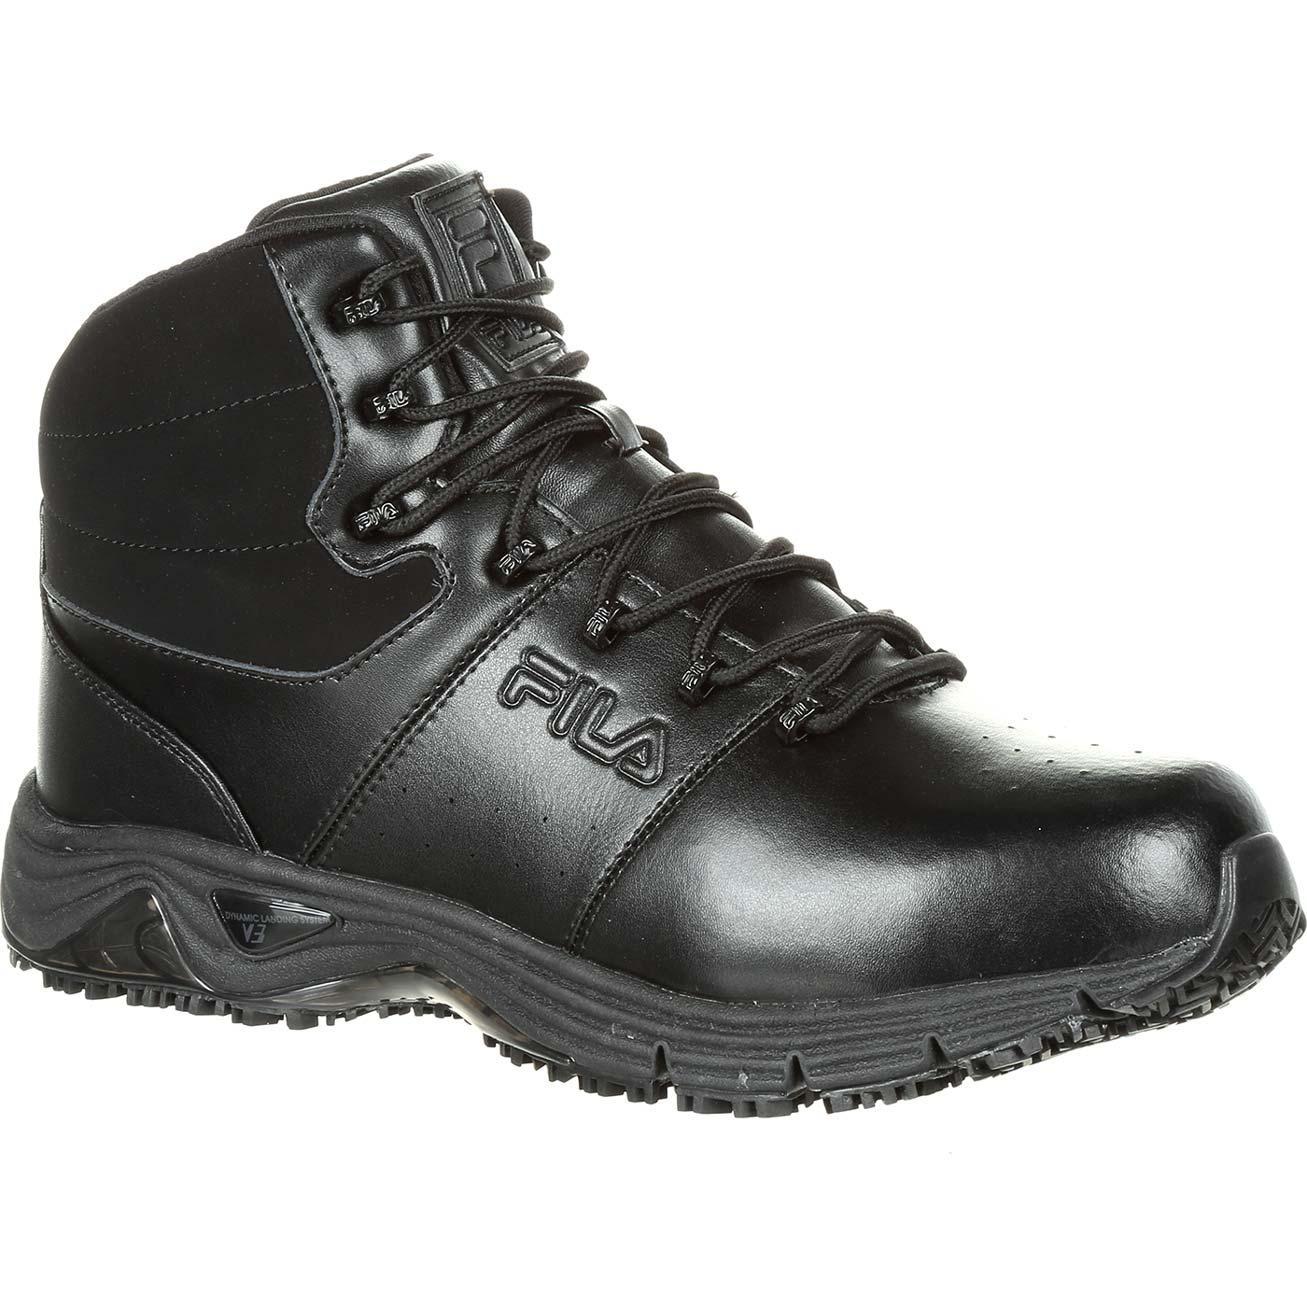 51a1e657cc Fila Memory Breach Steel Toe Slip-Resistant Work Hiker